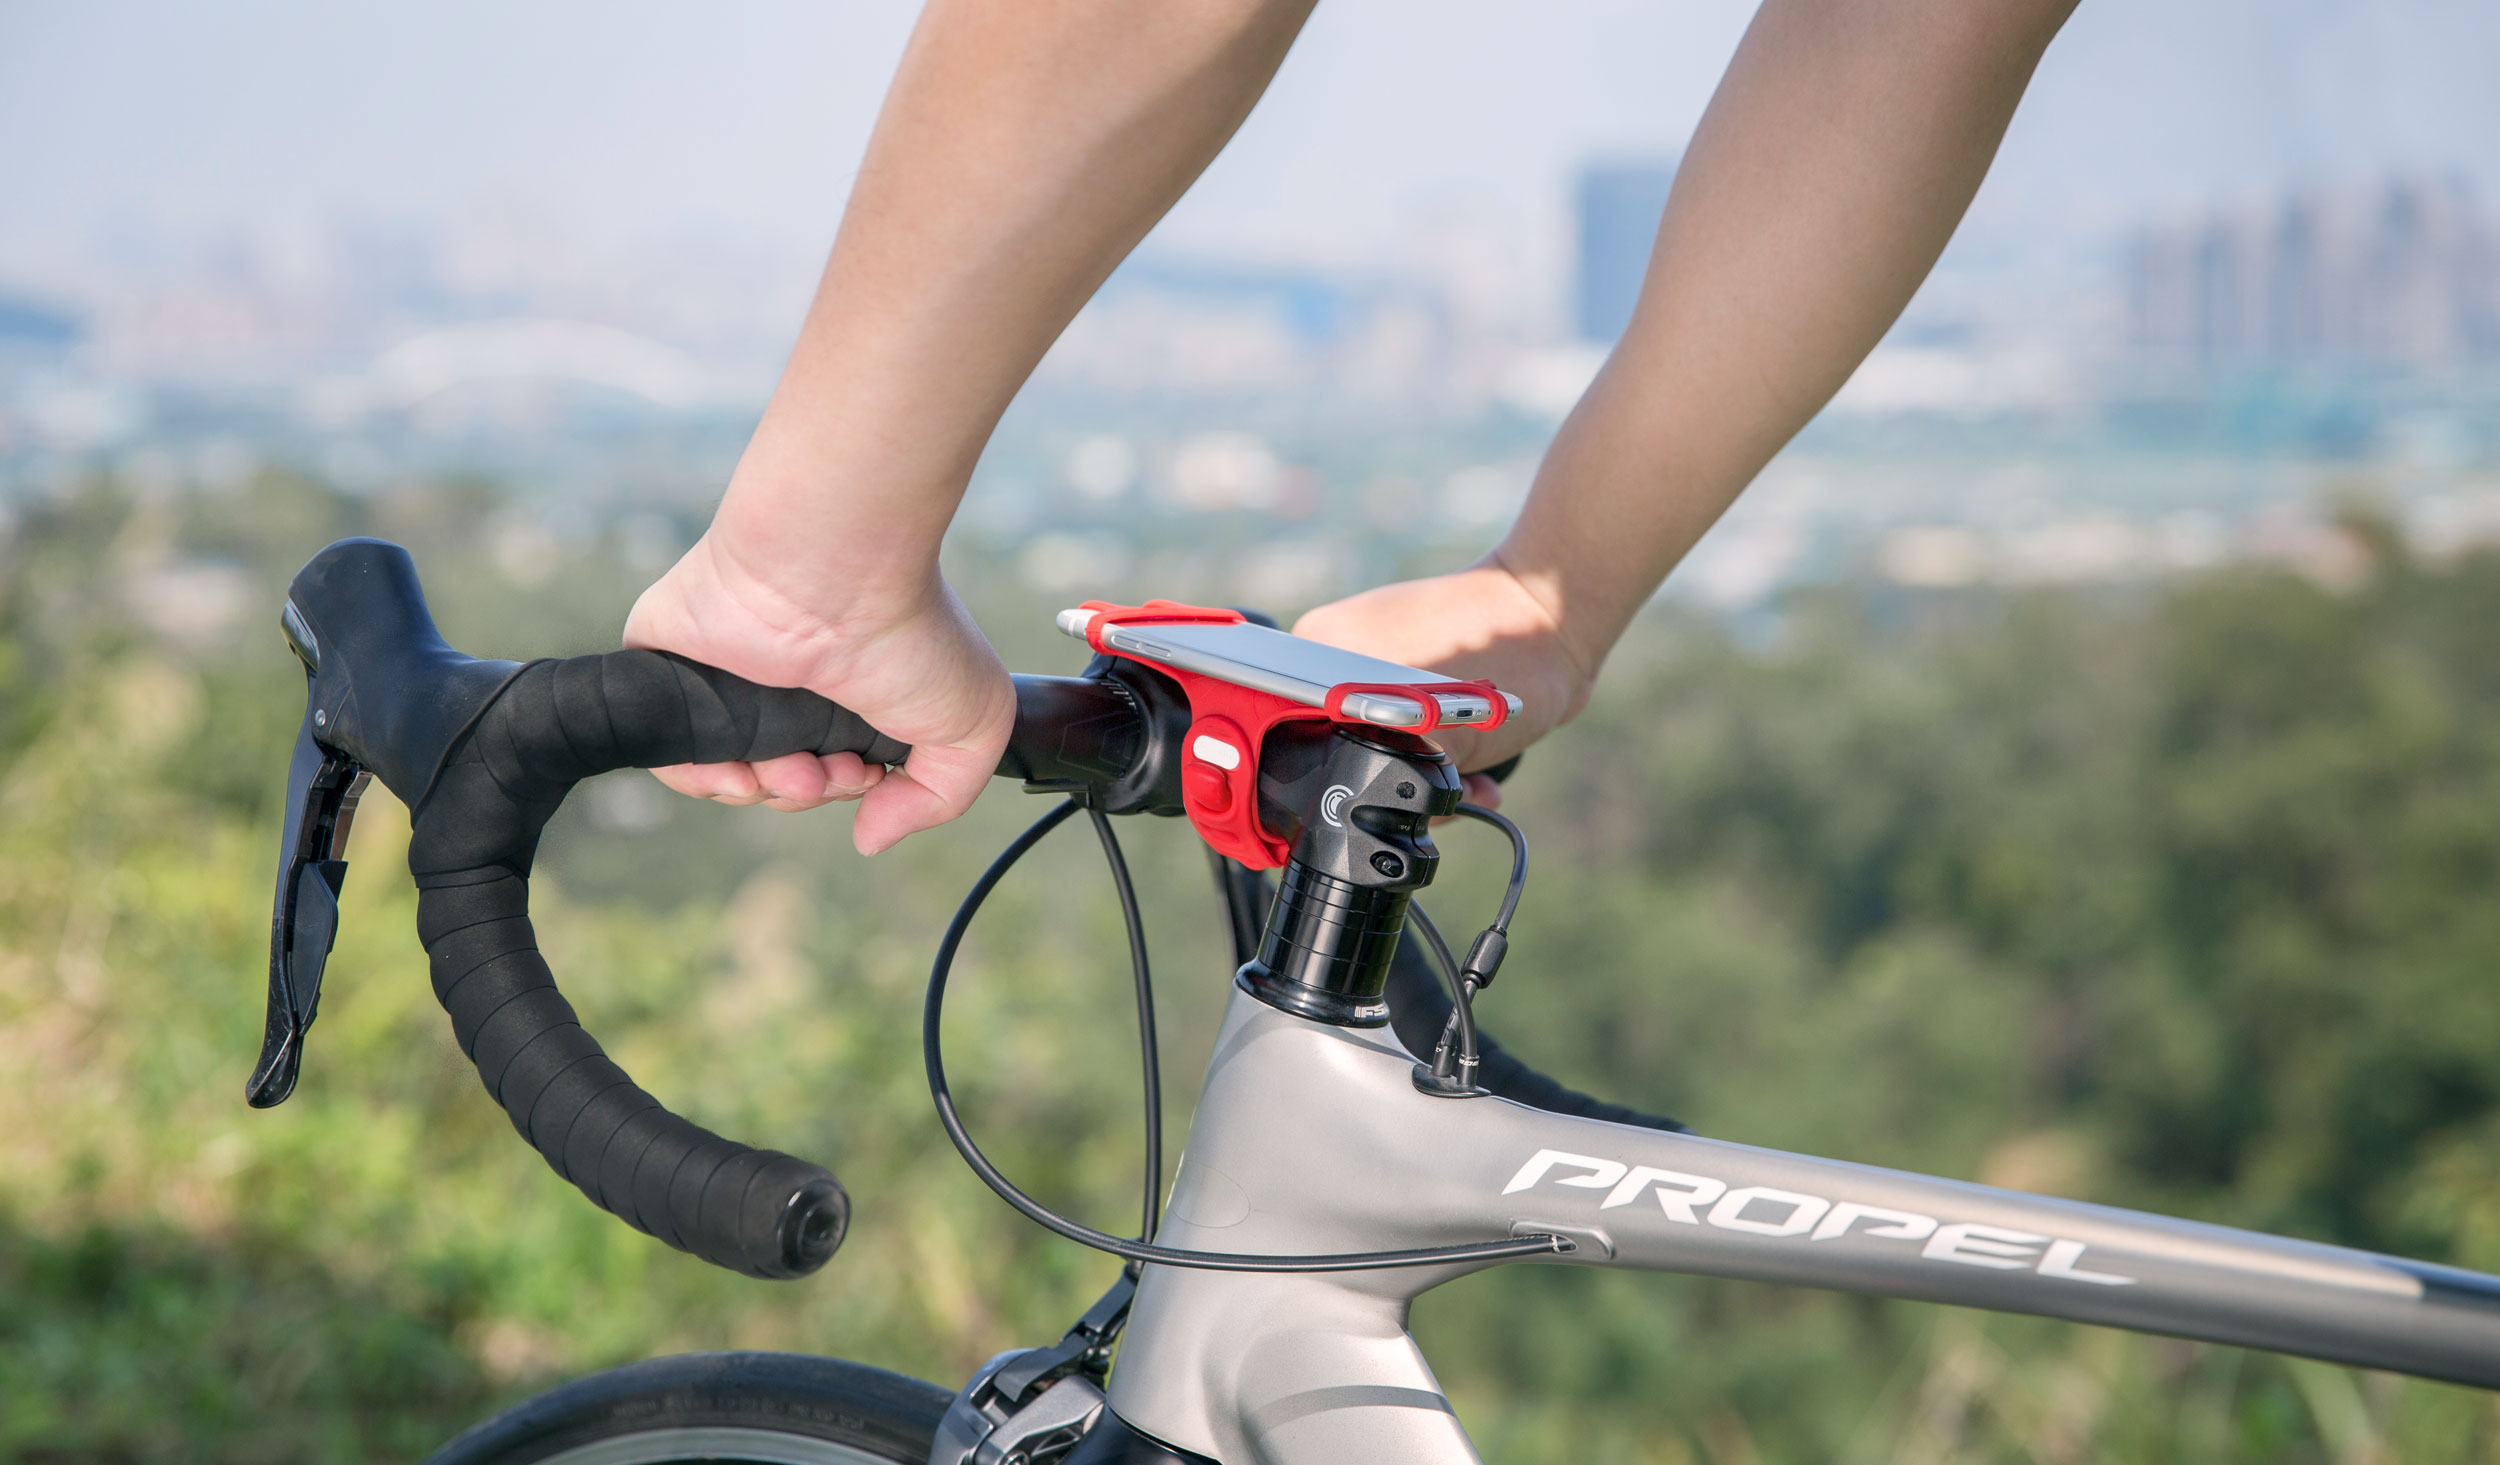 http://www.bonecollection.com/resources/product/photo/item_1346_field_22/original/biketiepro-photo1.jpg